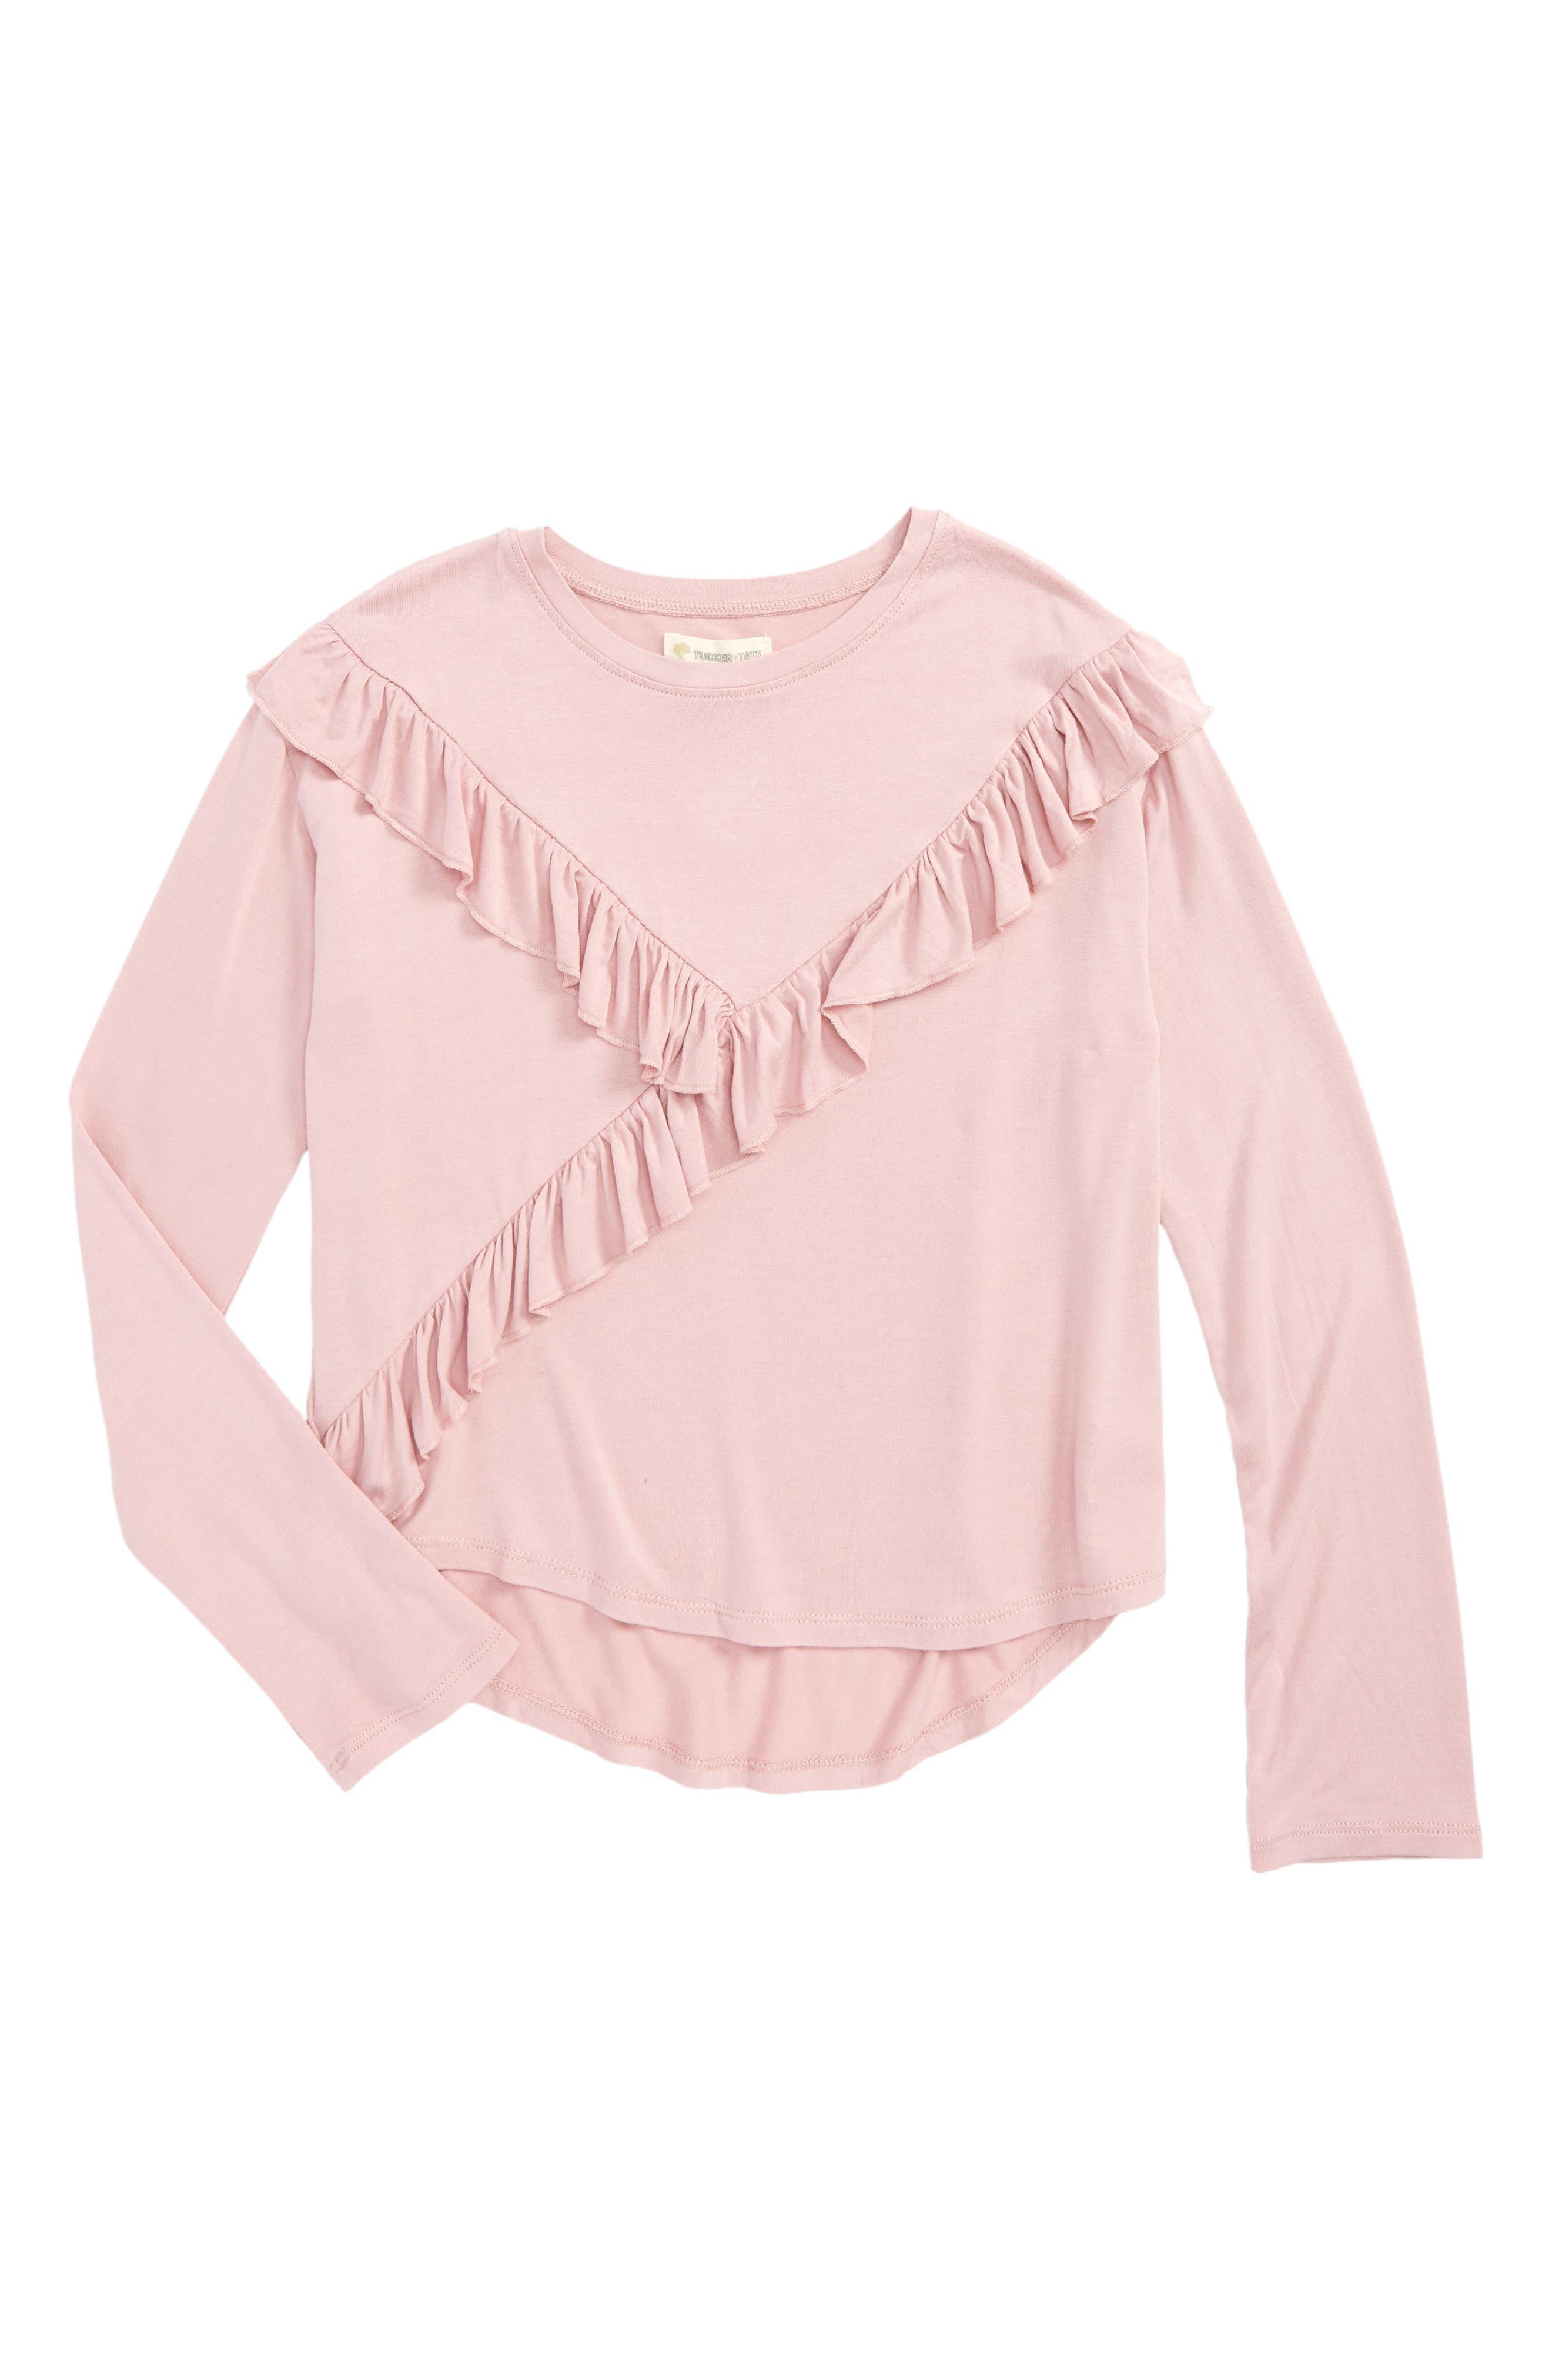 Ruffle Tee,                         Main,                         color, Pink Zephyr